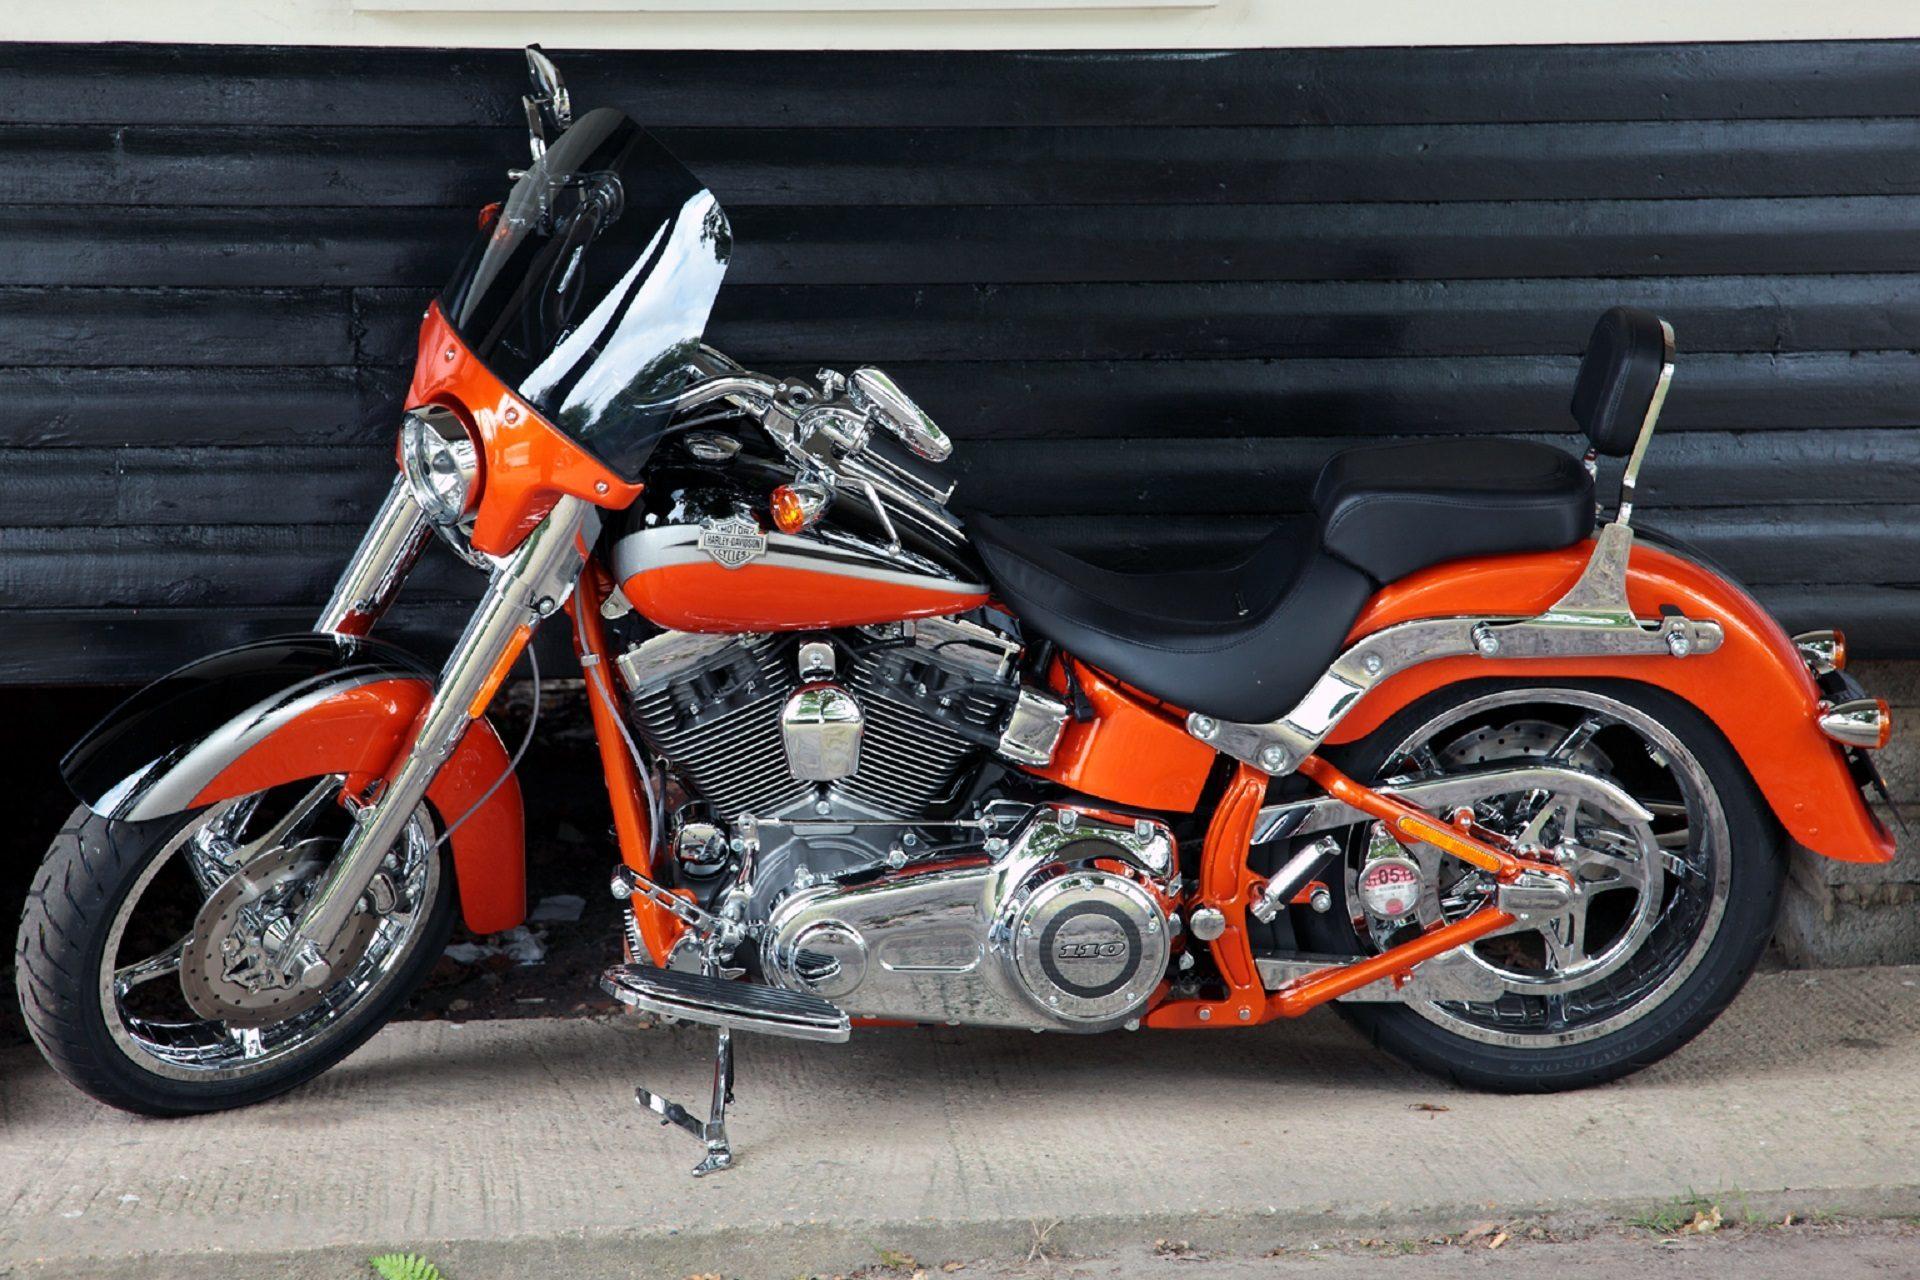 Moto, style, passion, Harley davidson, moto - Fonds d'écran HD - Professor-falken.com